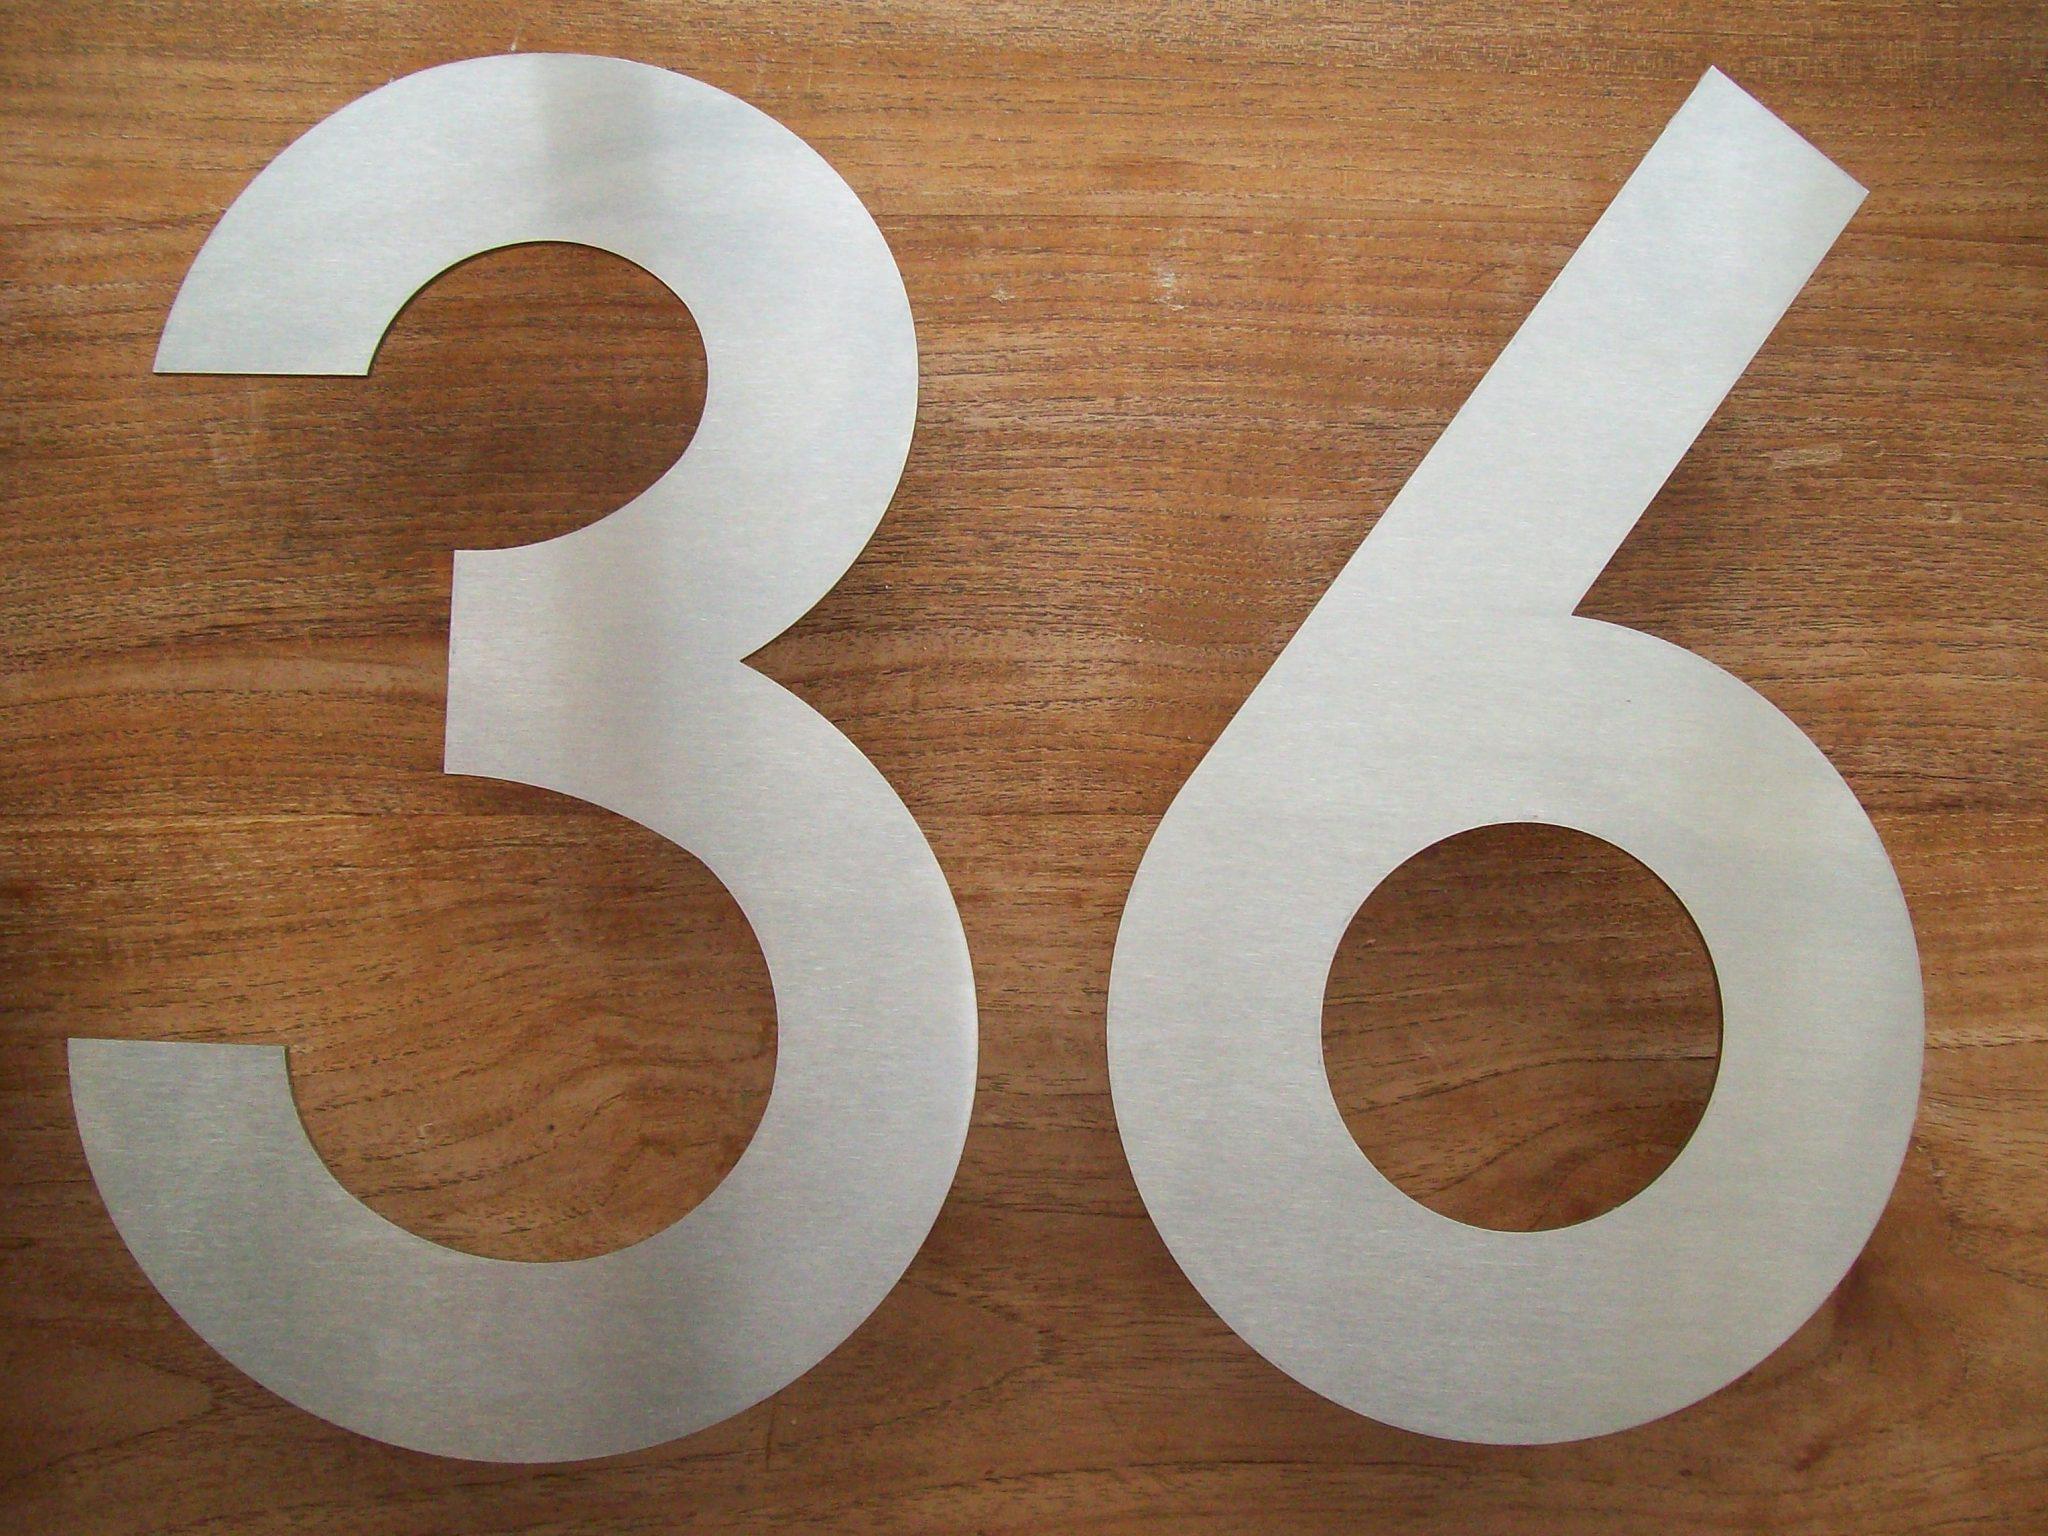 Huisnummer uit losse cijfers rvs316 2mm dik